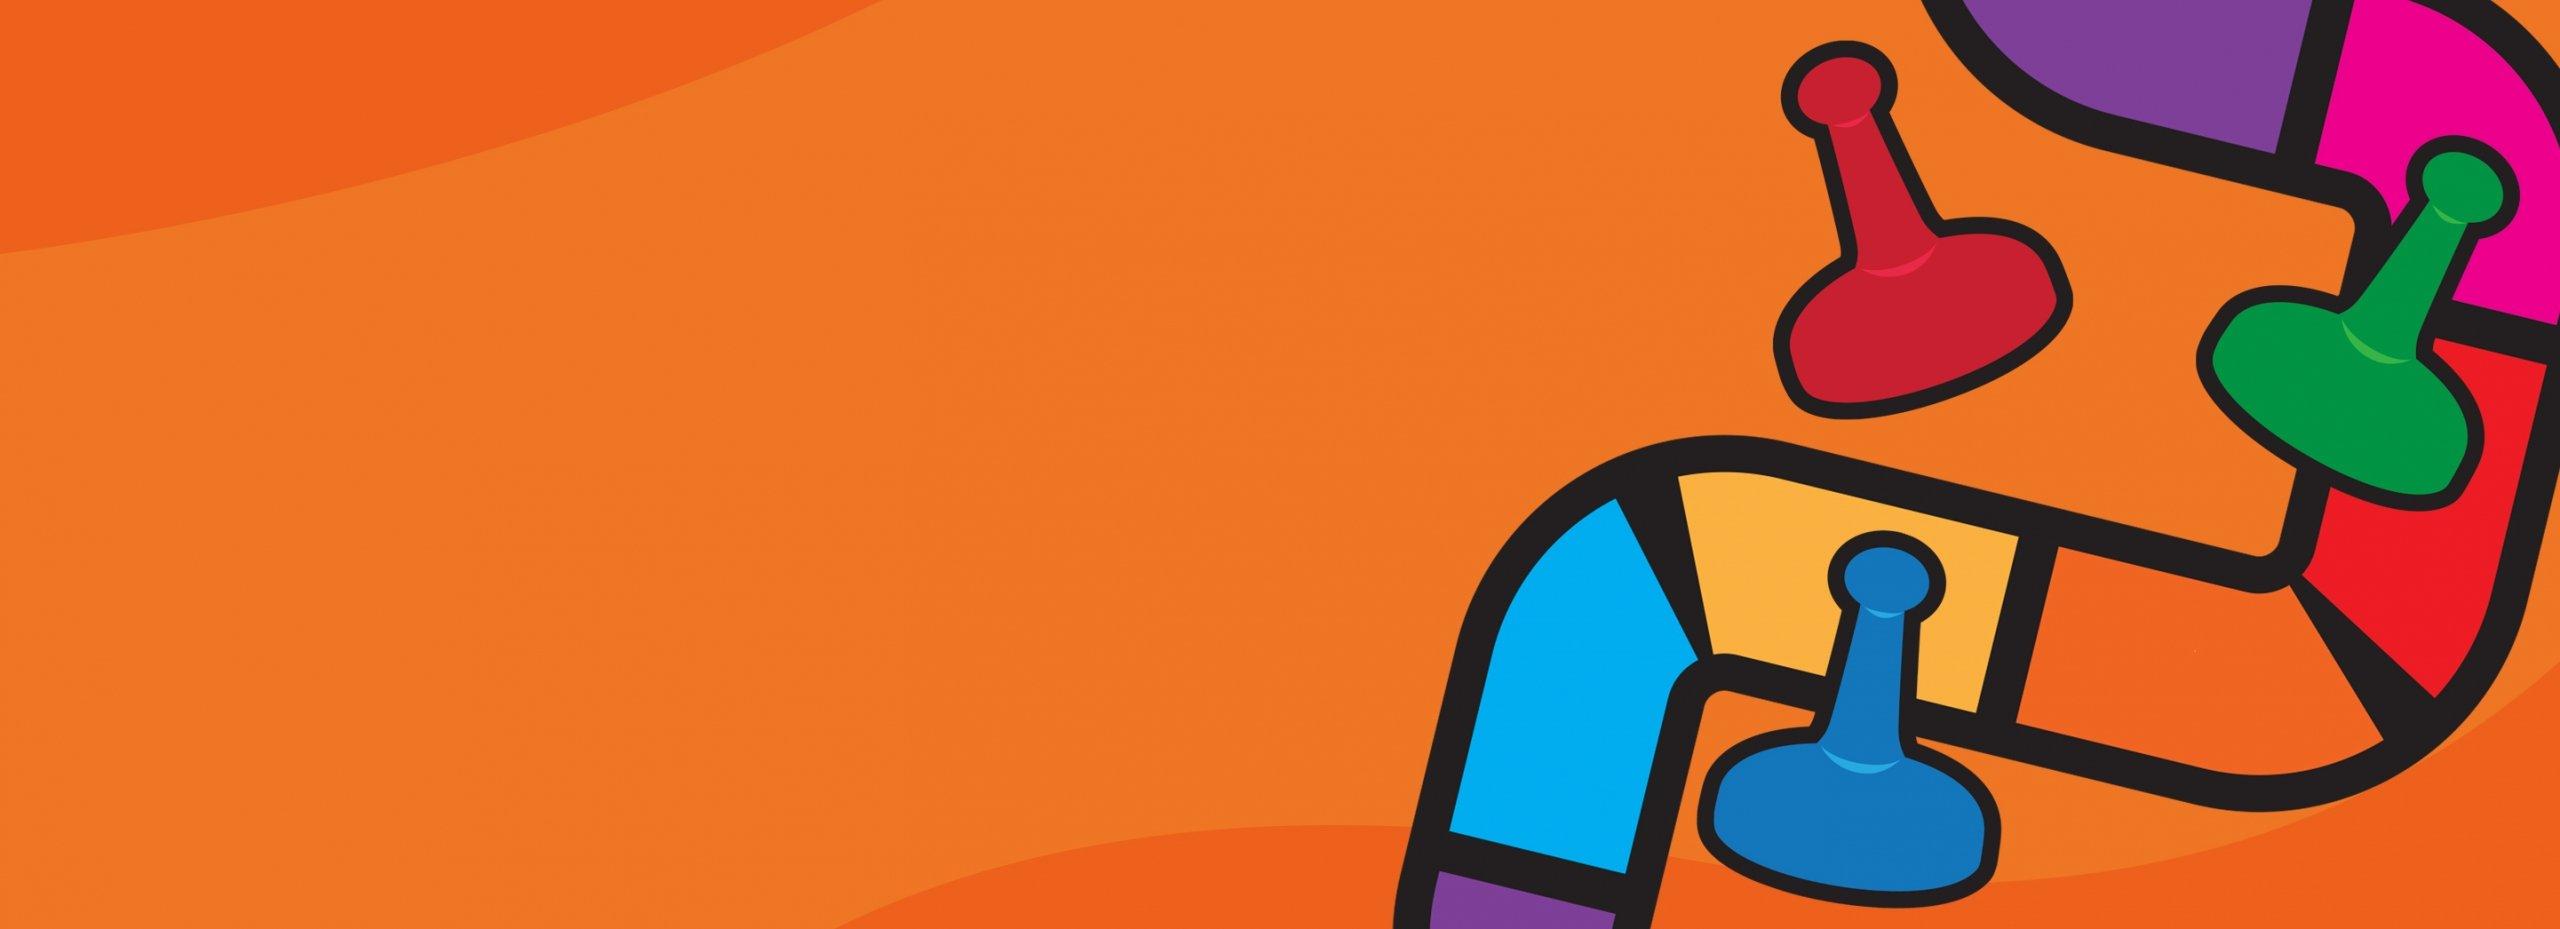 Game Board Image